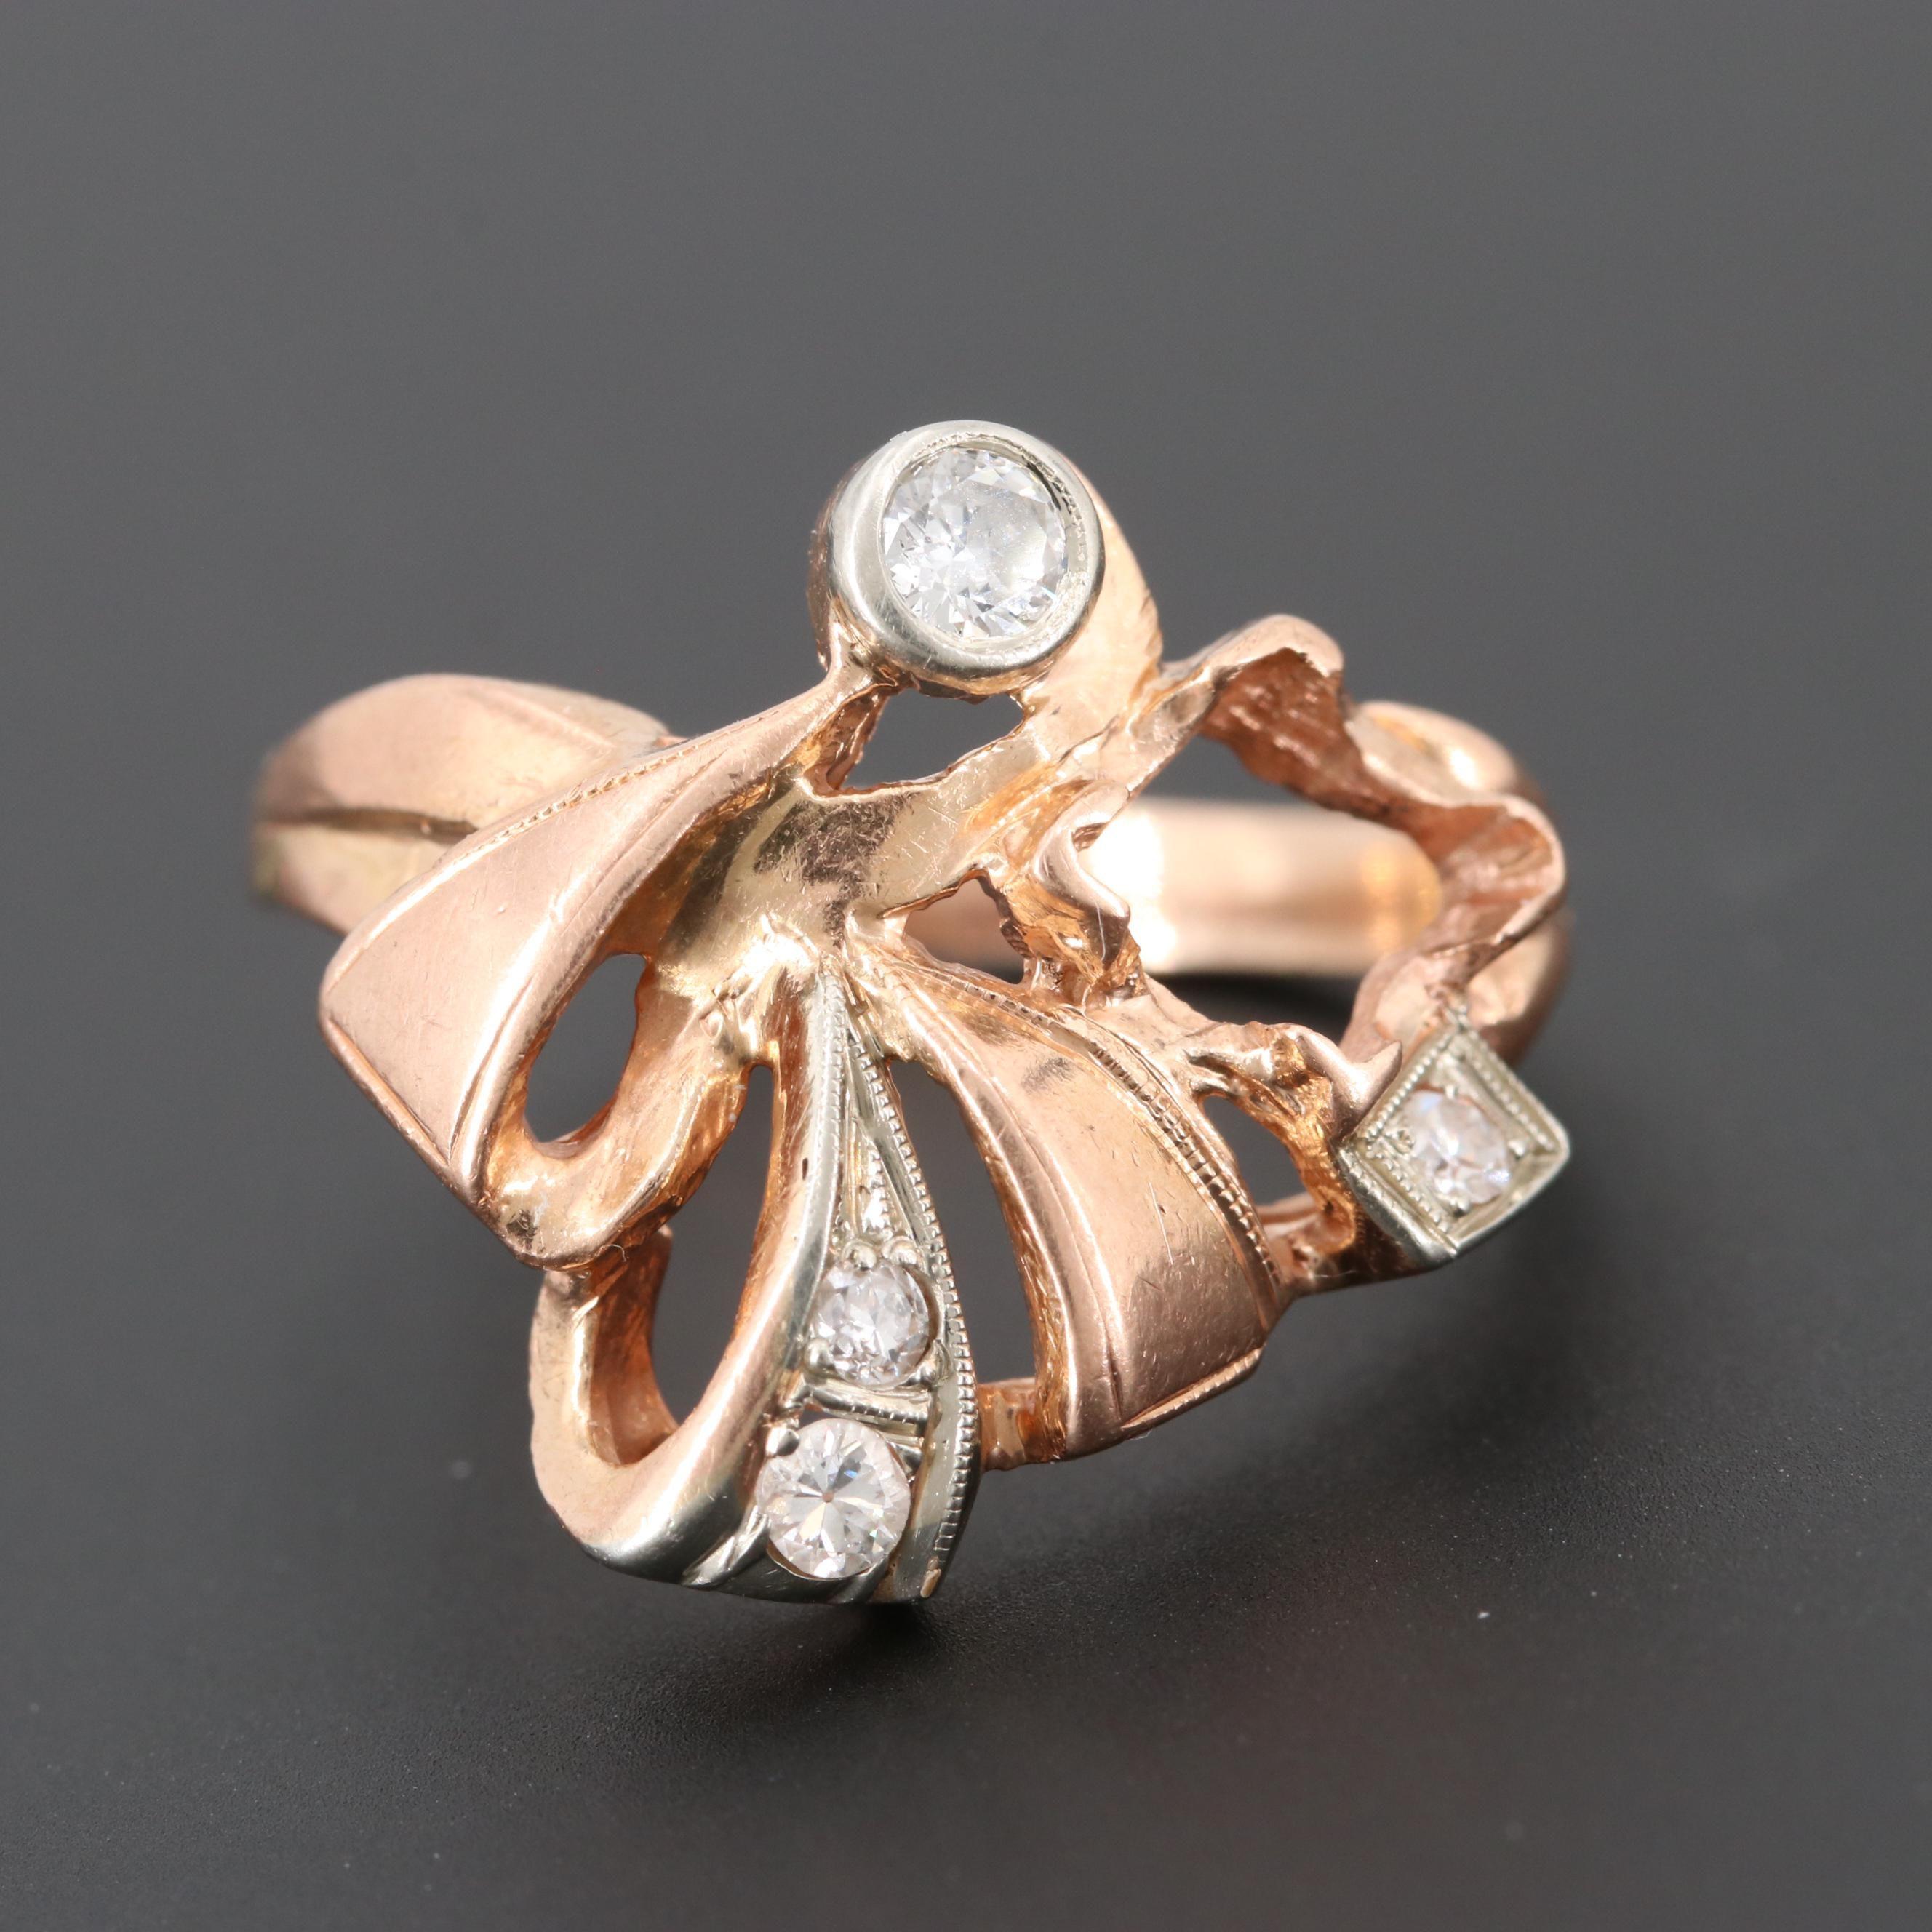 Retro 10K Rose Gold Semi-Mount Diamond Ring